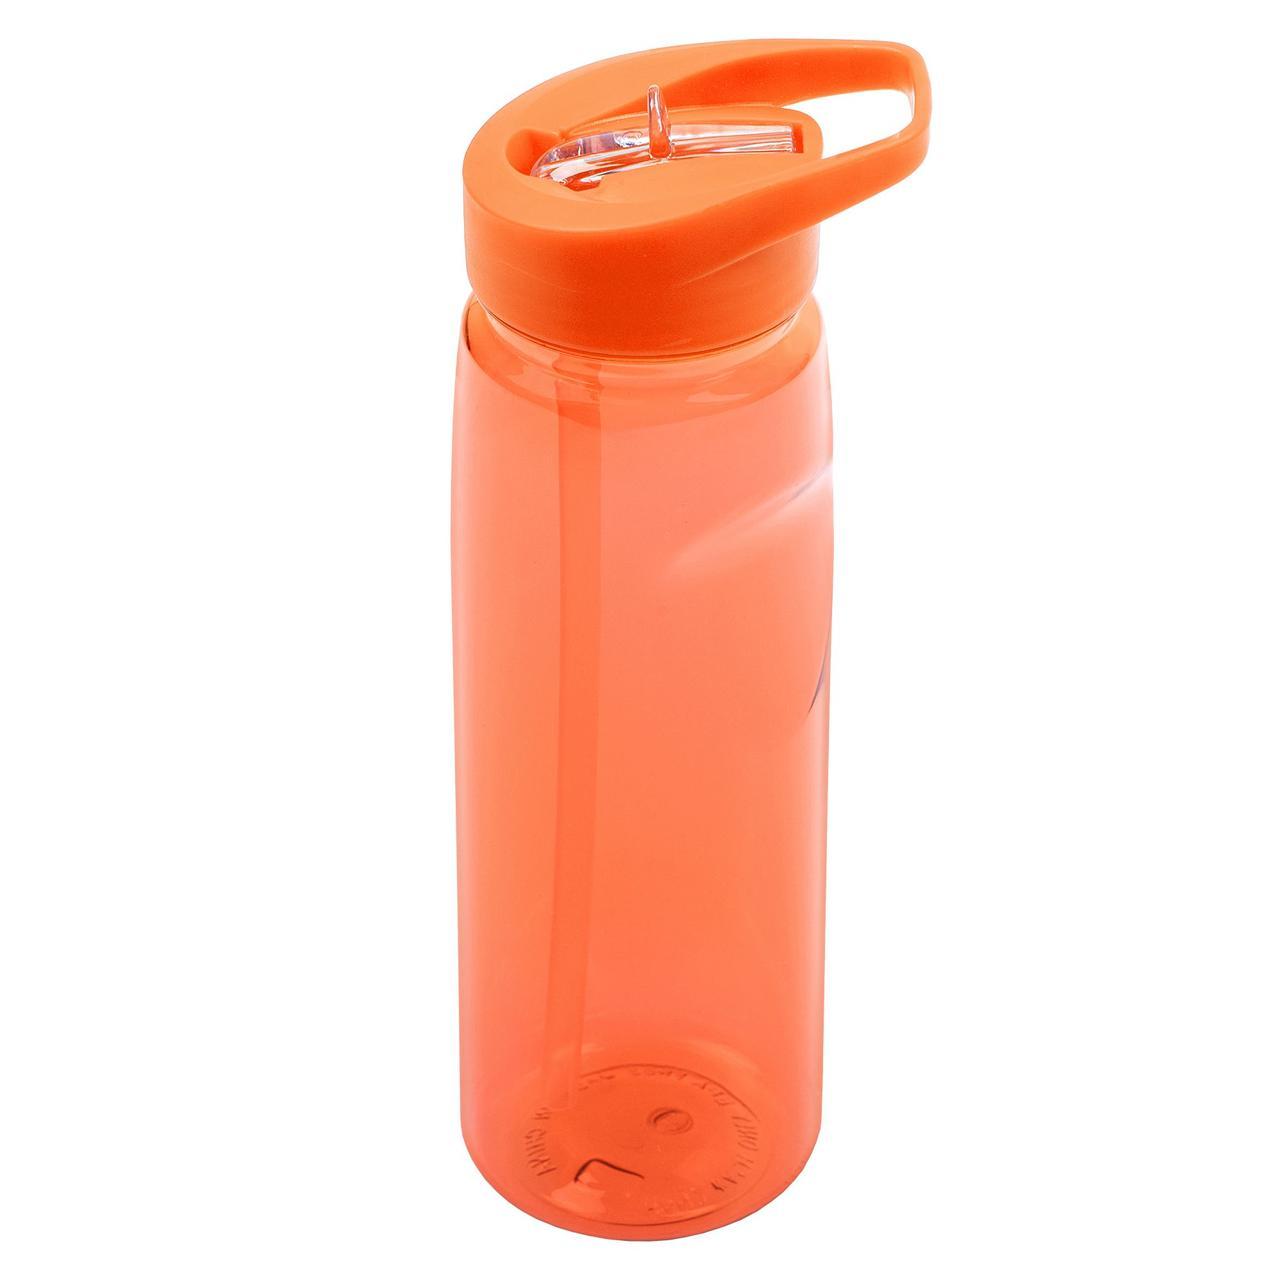 Спортивная бутылка Start, оранжевая (артикул 2826.20)